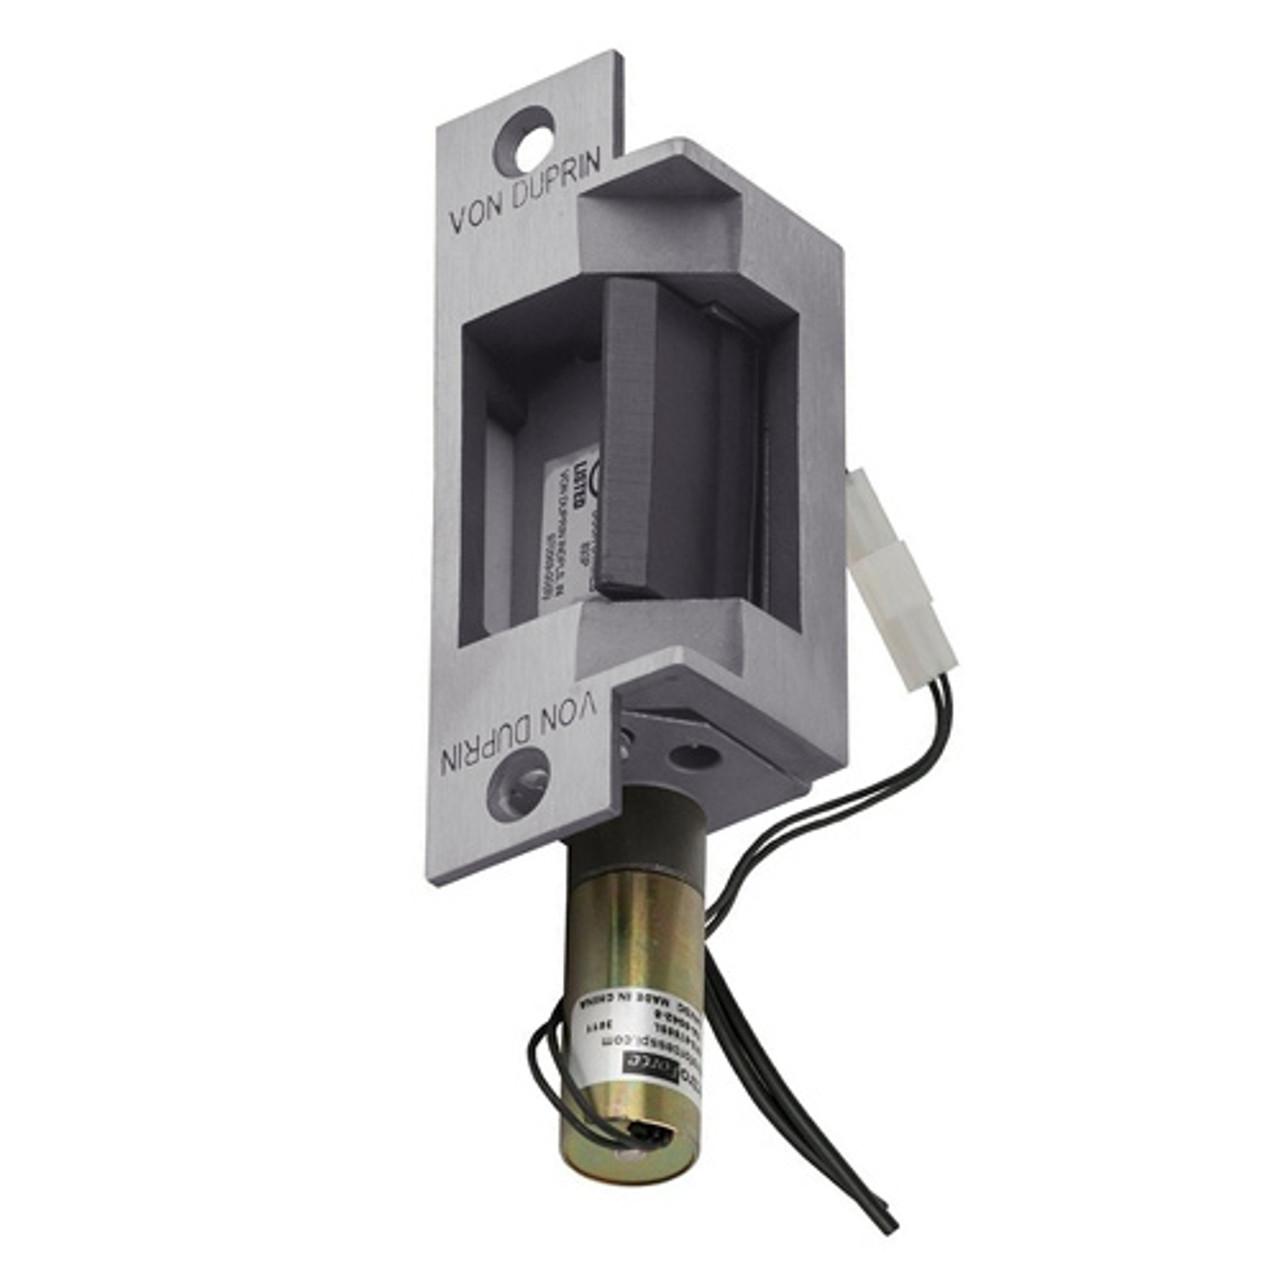 Von Duprin 6211 FSE 12VDC US32D Heavy-Duty Electric Strike for Cylindrical Lock 12VDC Stainless Steel Finish